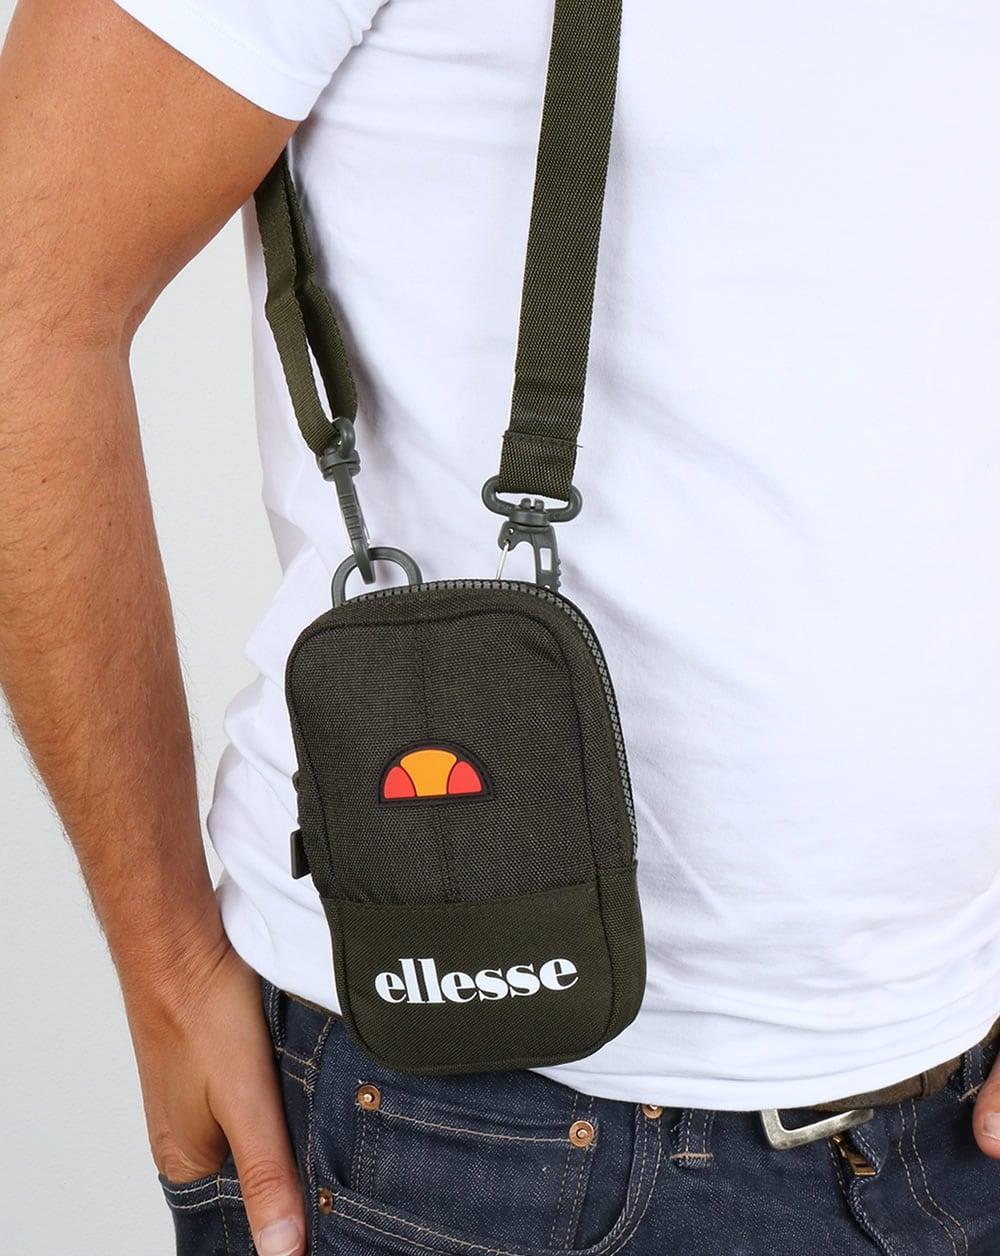 971cf6ecc4 Ellesse Ellesse Ruggero Small Items Bag Khaki khaki Marl